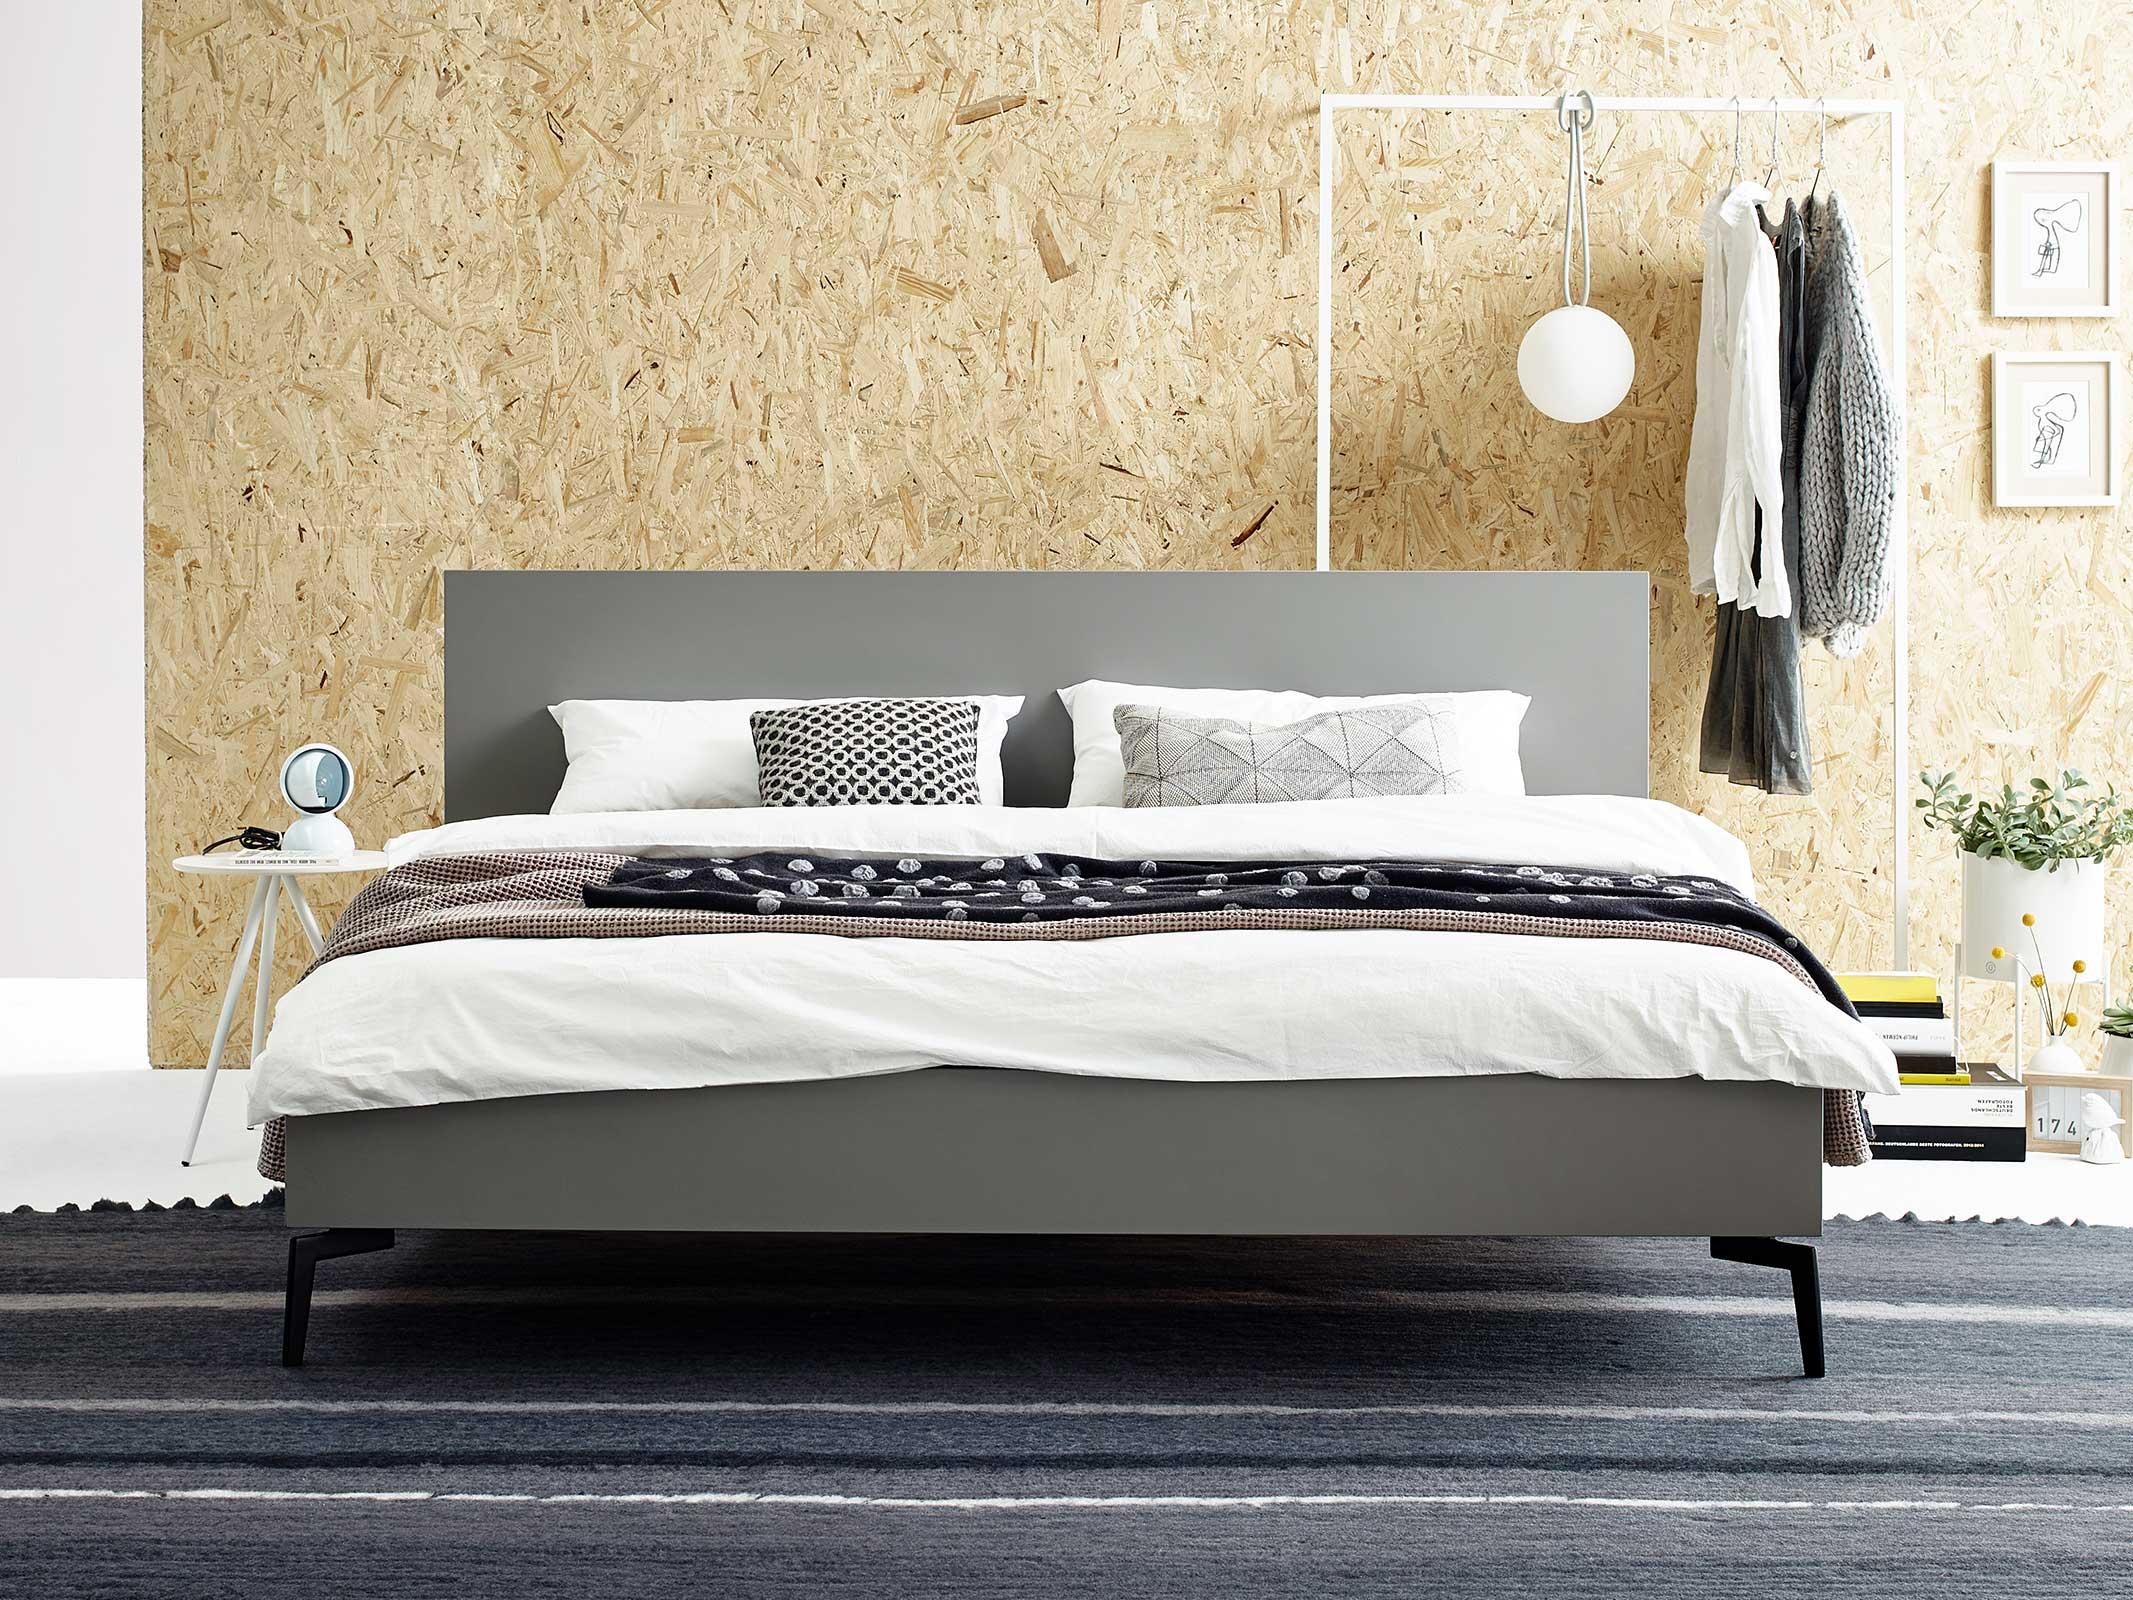 Full Size of Mller Design Betten Bett Smart Ebay 180x200 Schlafzimmer Set Mit Boxspringbett Platzsparend Boxspring Landhausstil Kaufen Günstig Lattenrost Großes 120x200 Bett Bett Schlicht